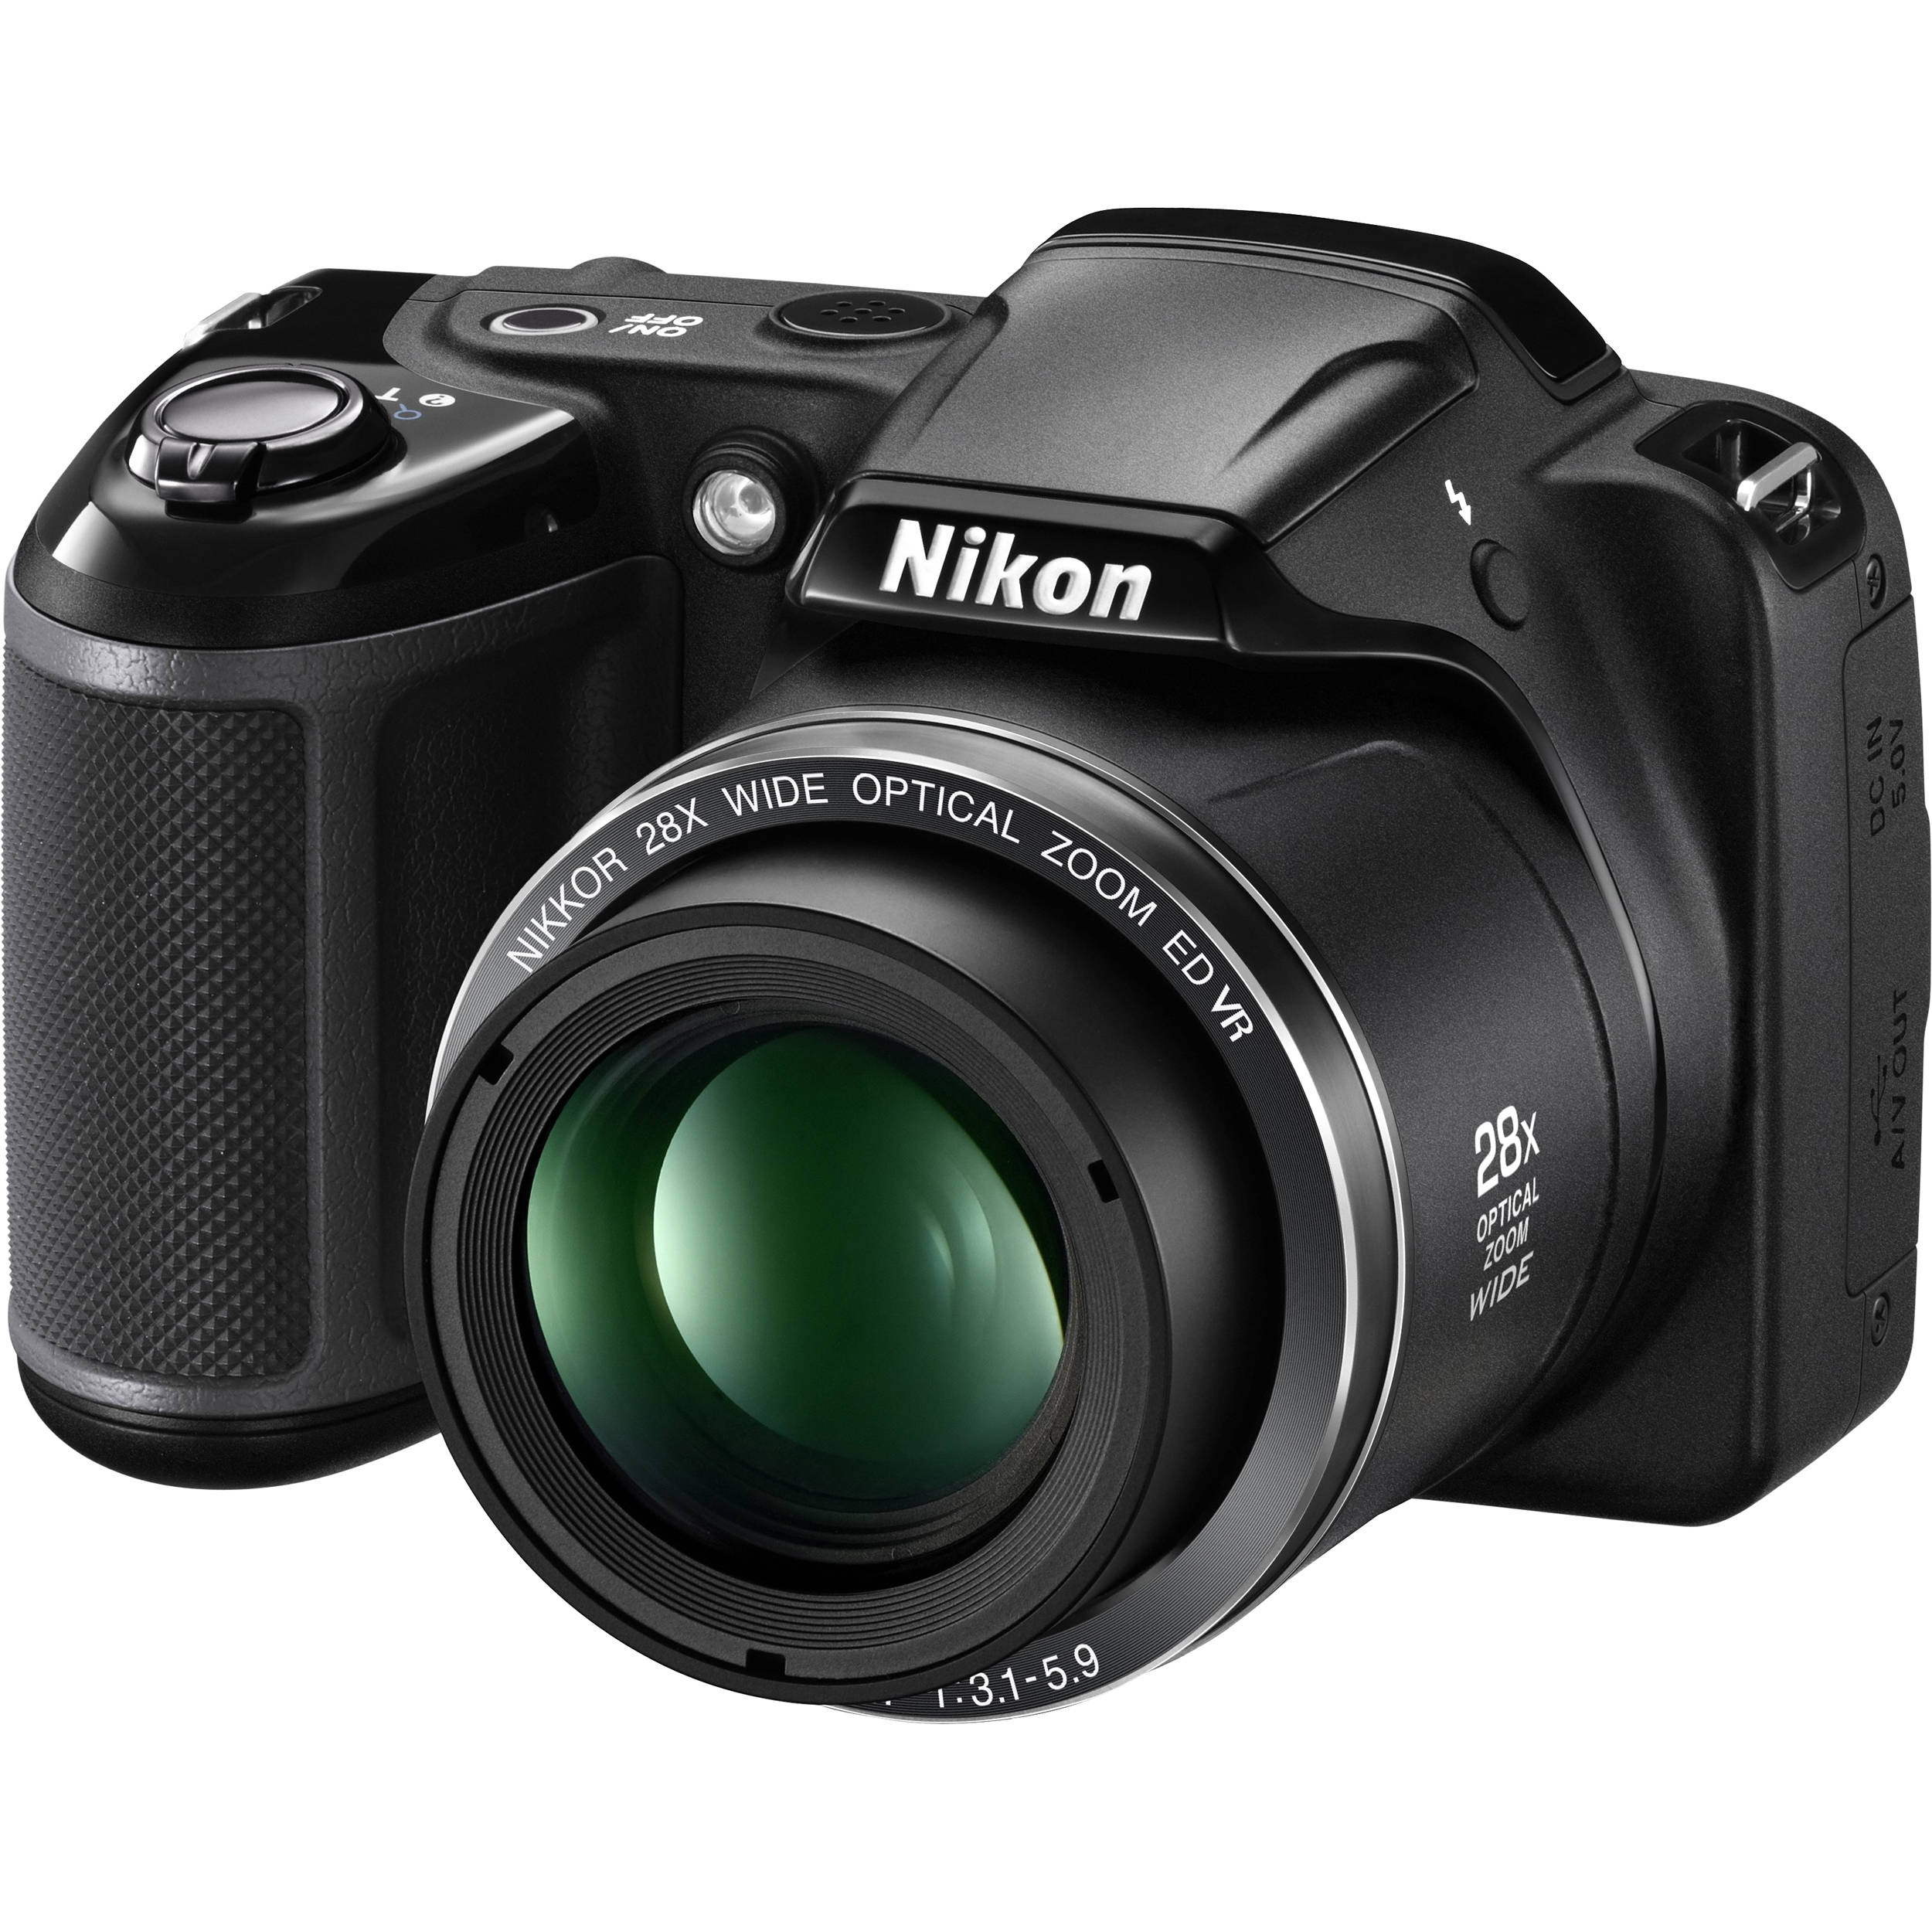 Nikon COOLPIX L340 Digital Camera (Black) 26484 B&H Photo Video